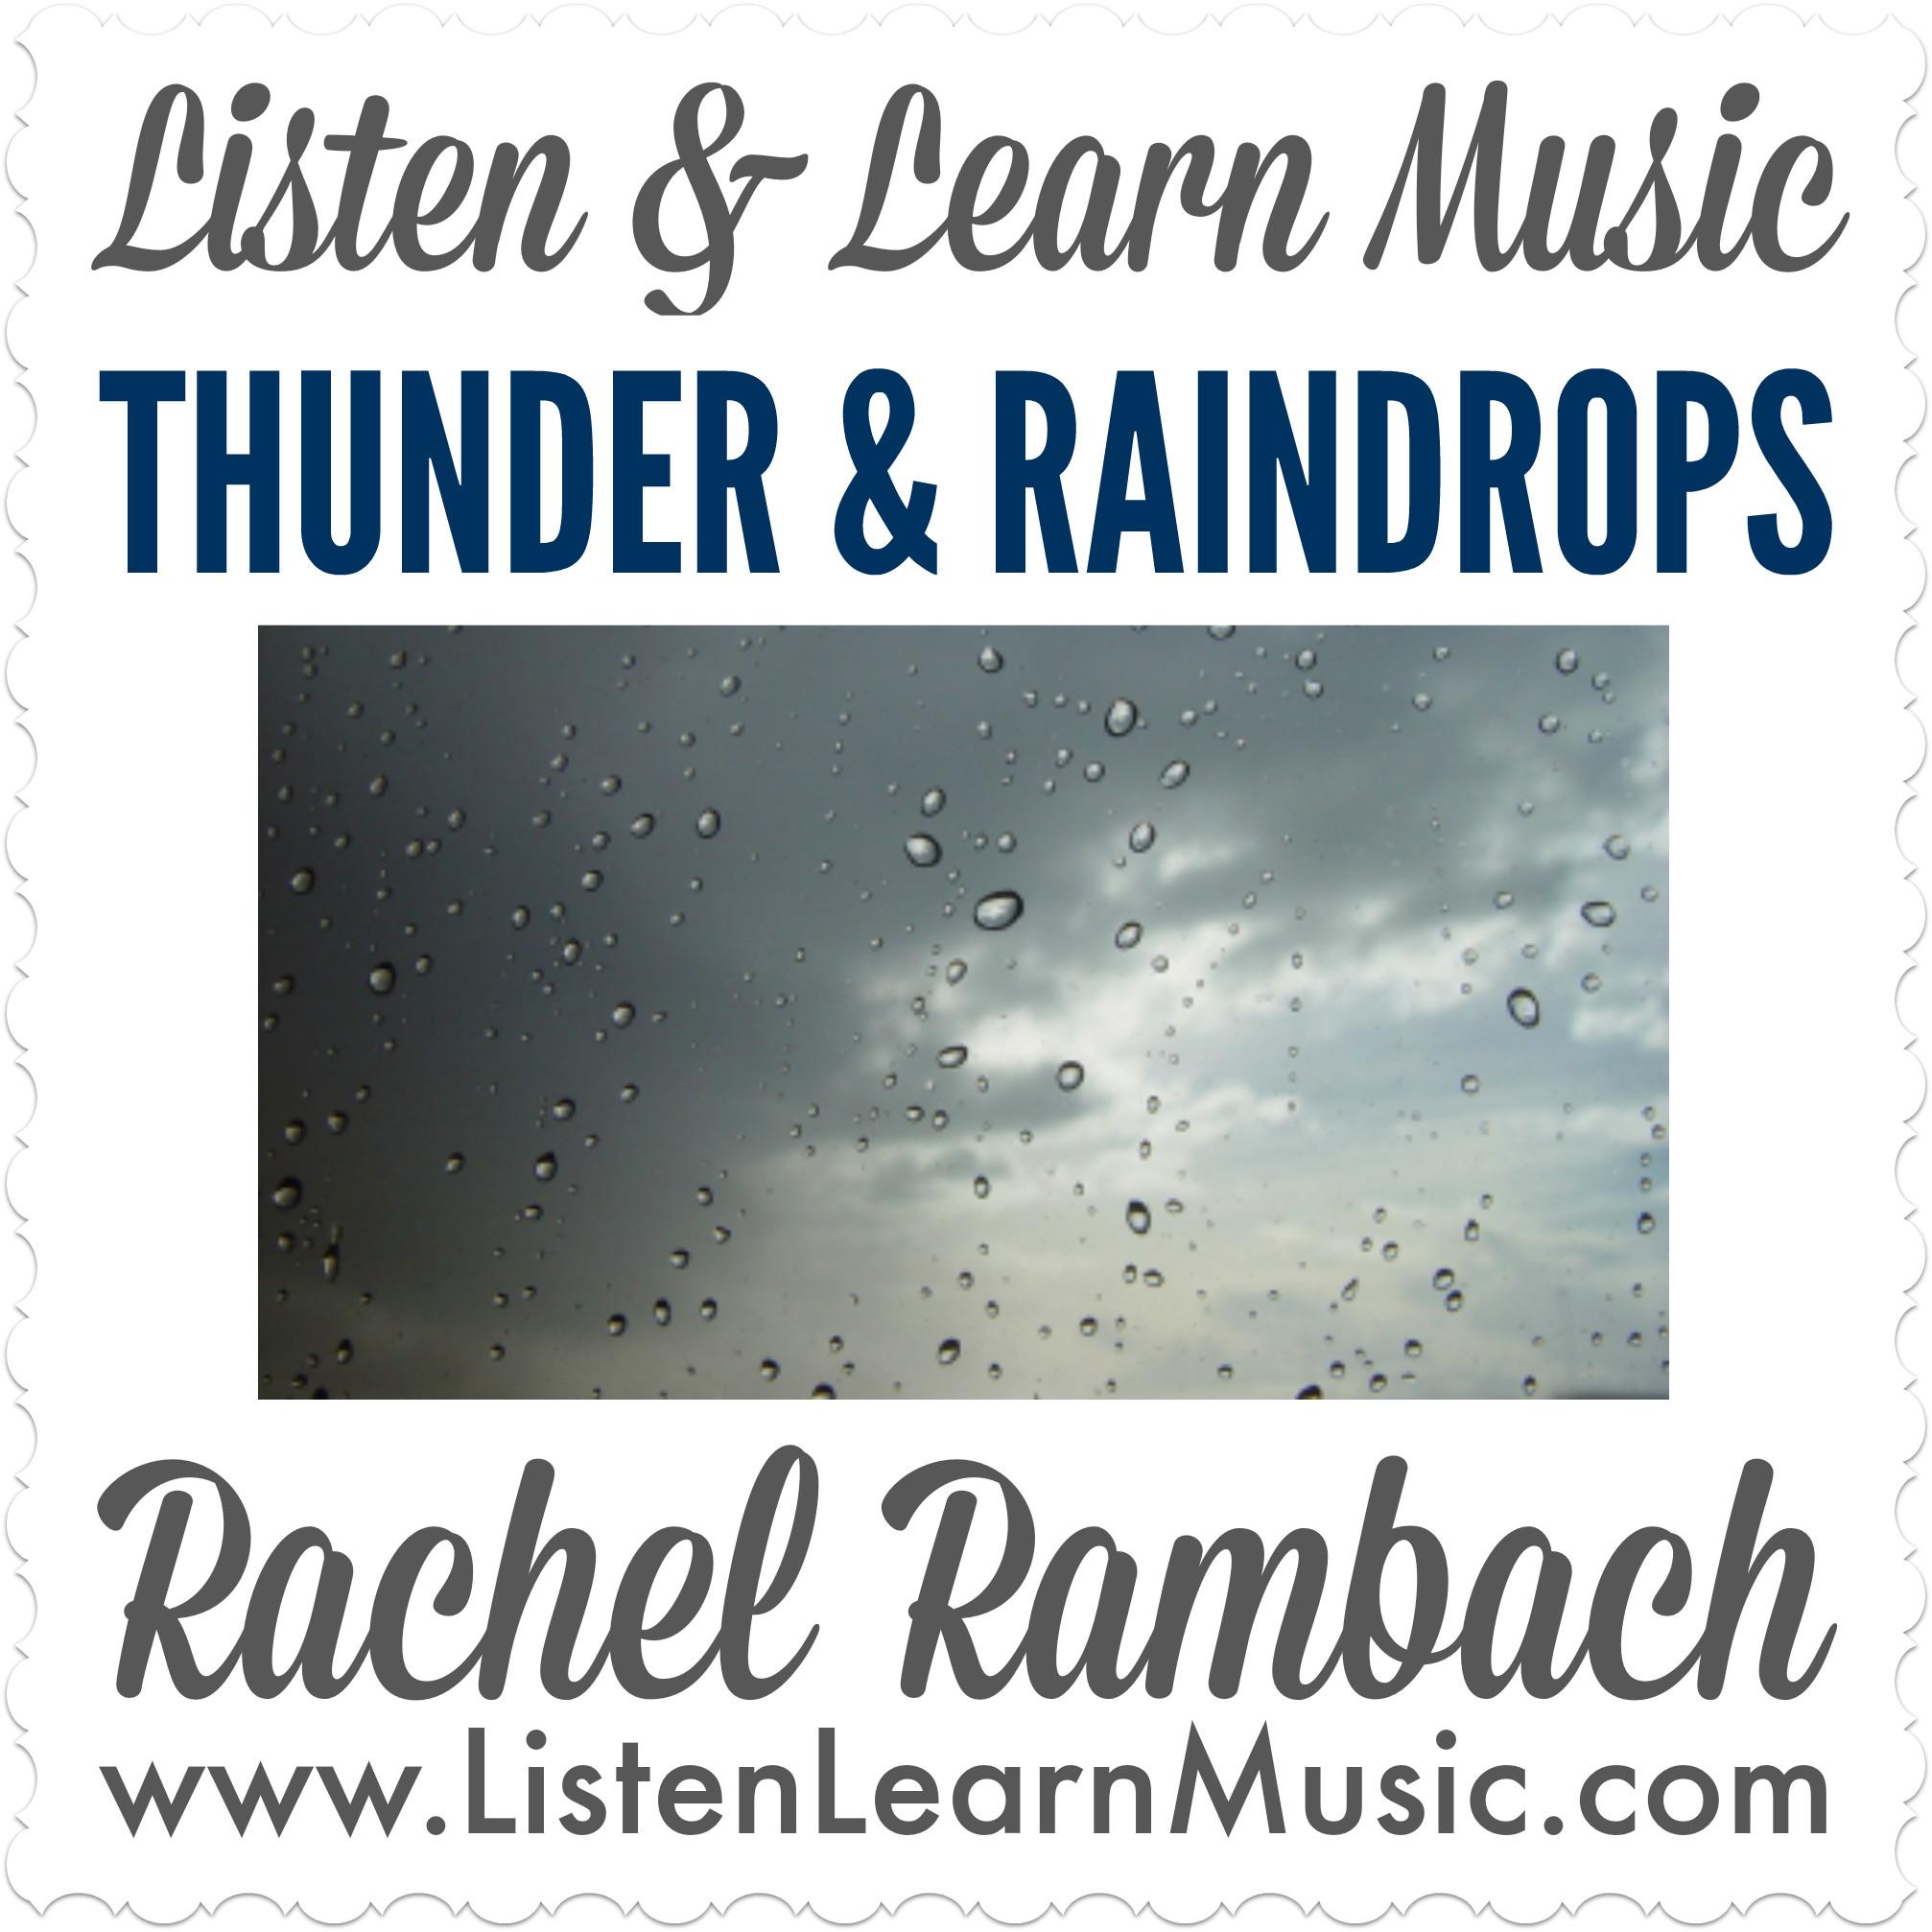 Thunder & Raindrops